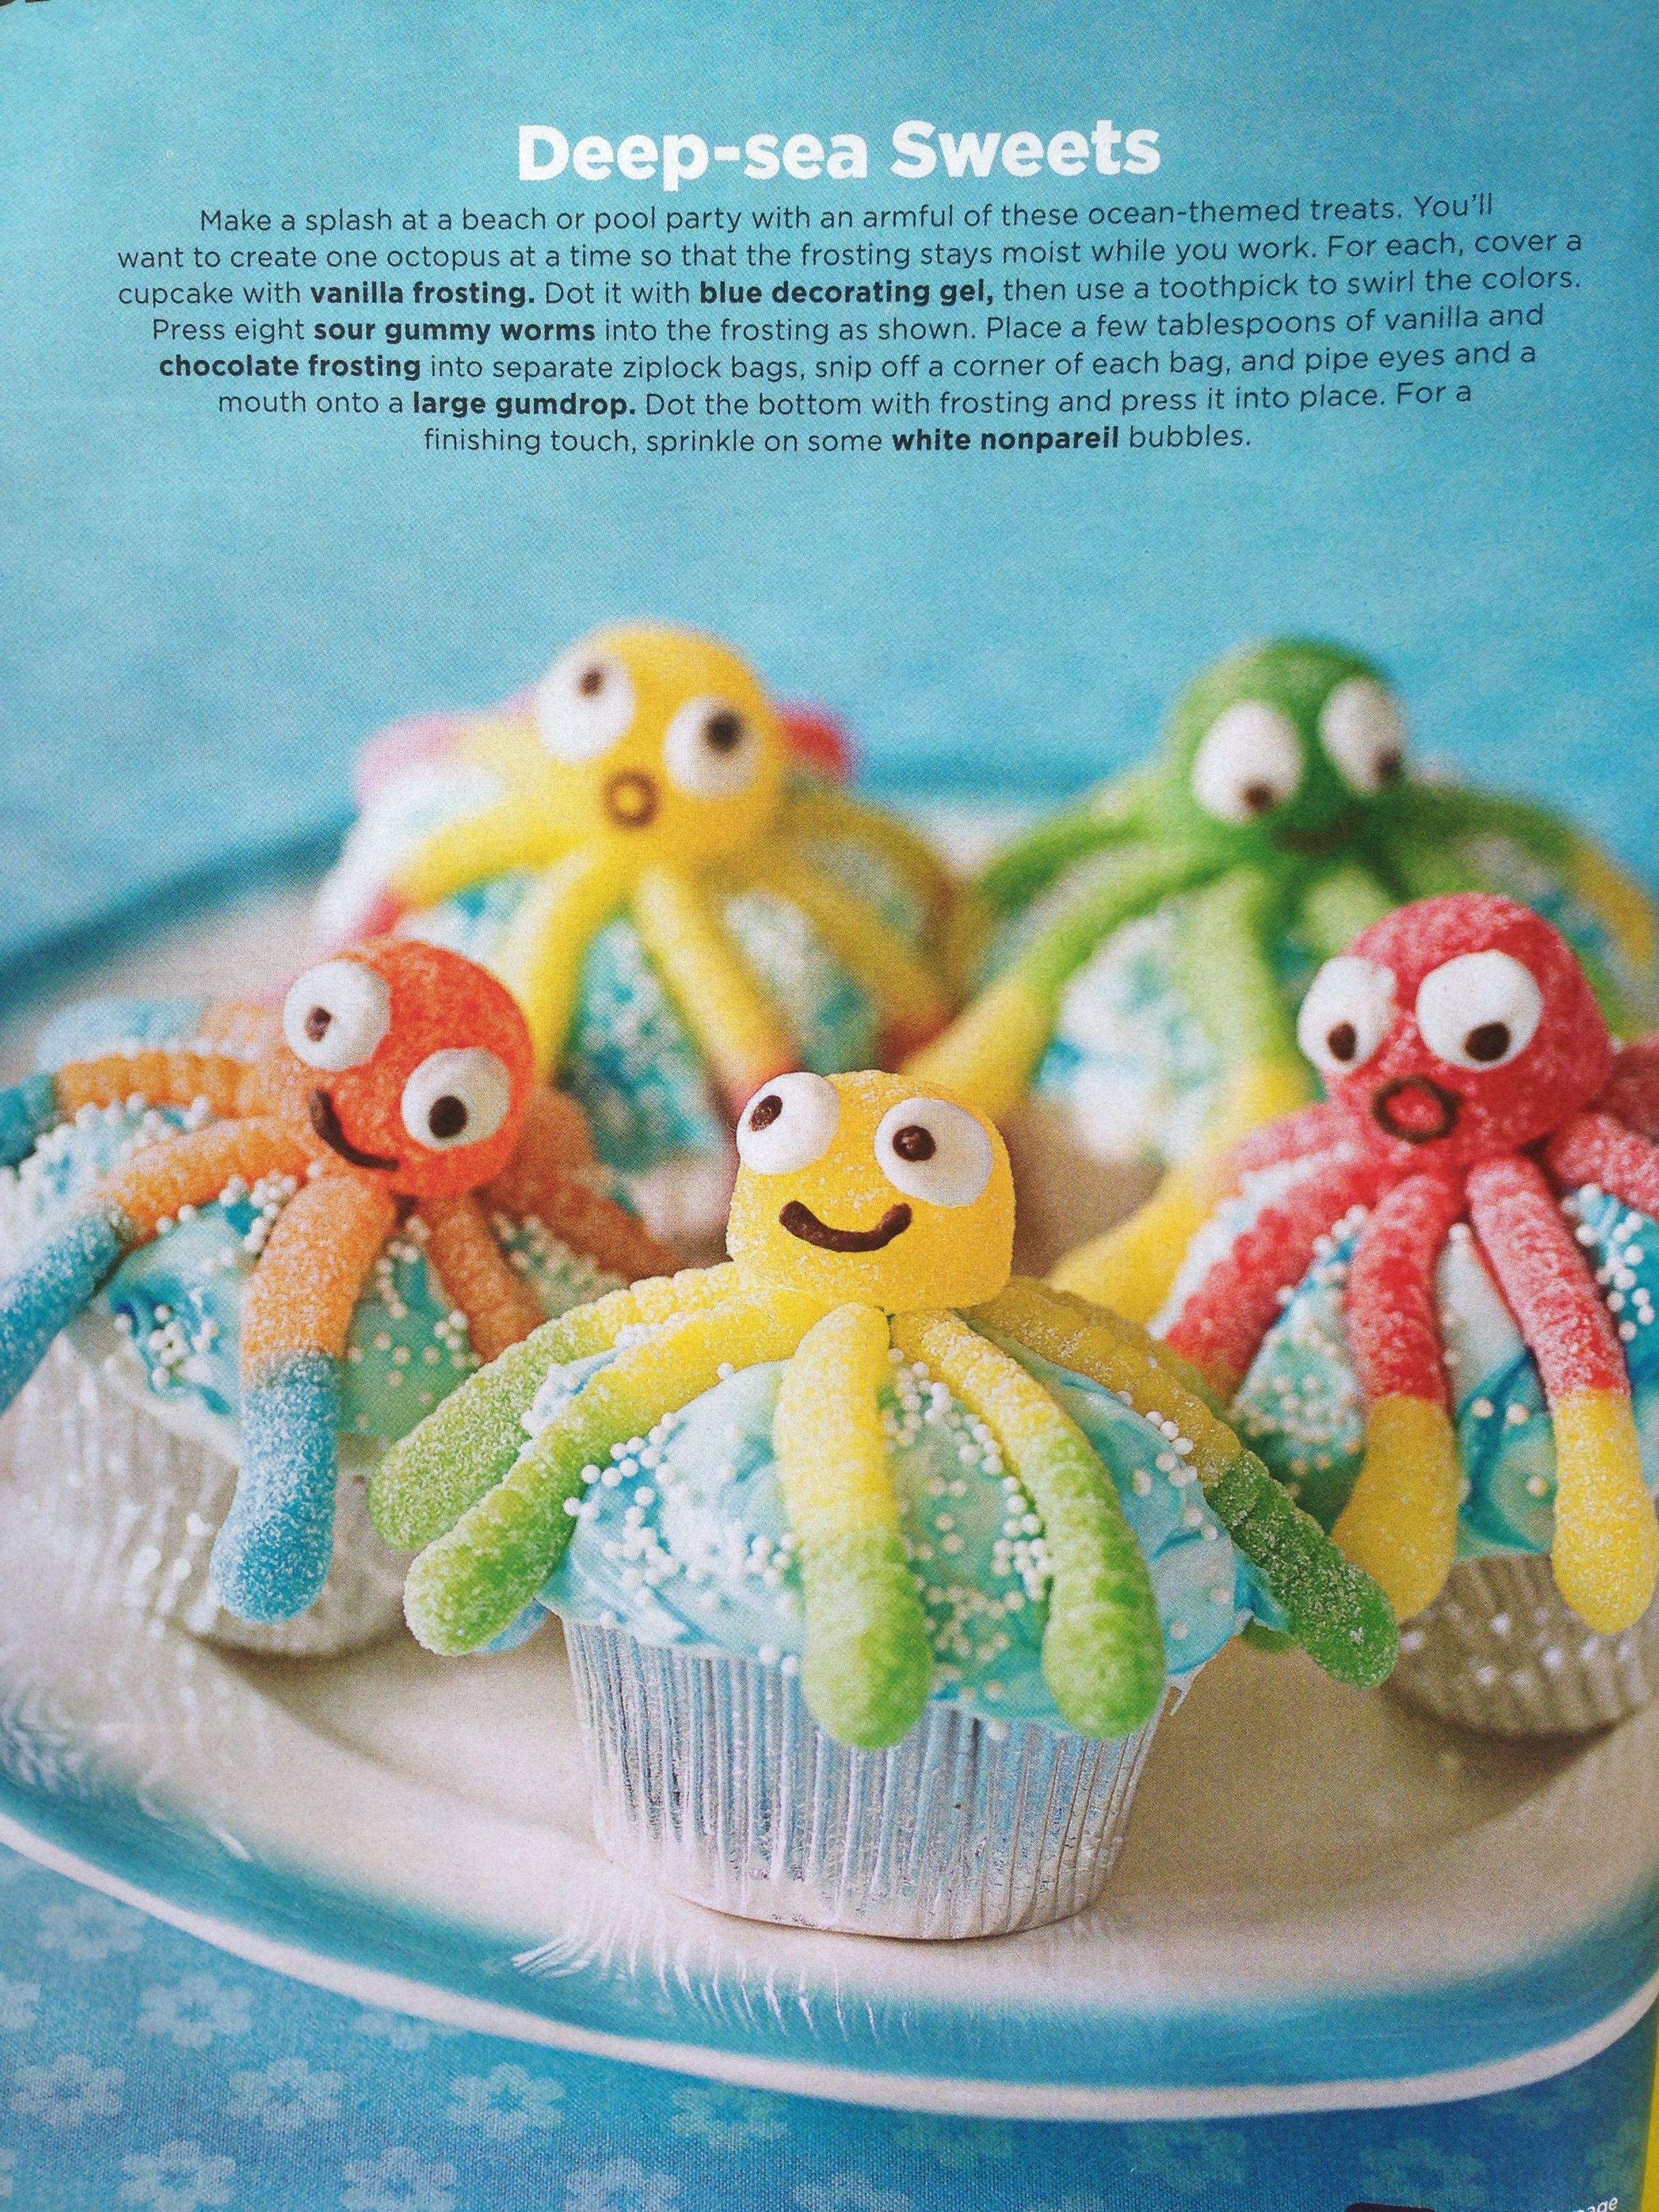 hihi lustig desserts cakes sweets pinterest backen kuchen und cupcakes. Black Bedroom Furniture Sets. Home Design Ideas